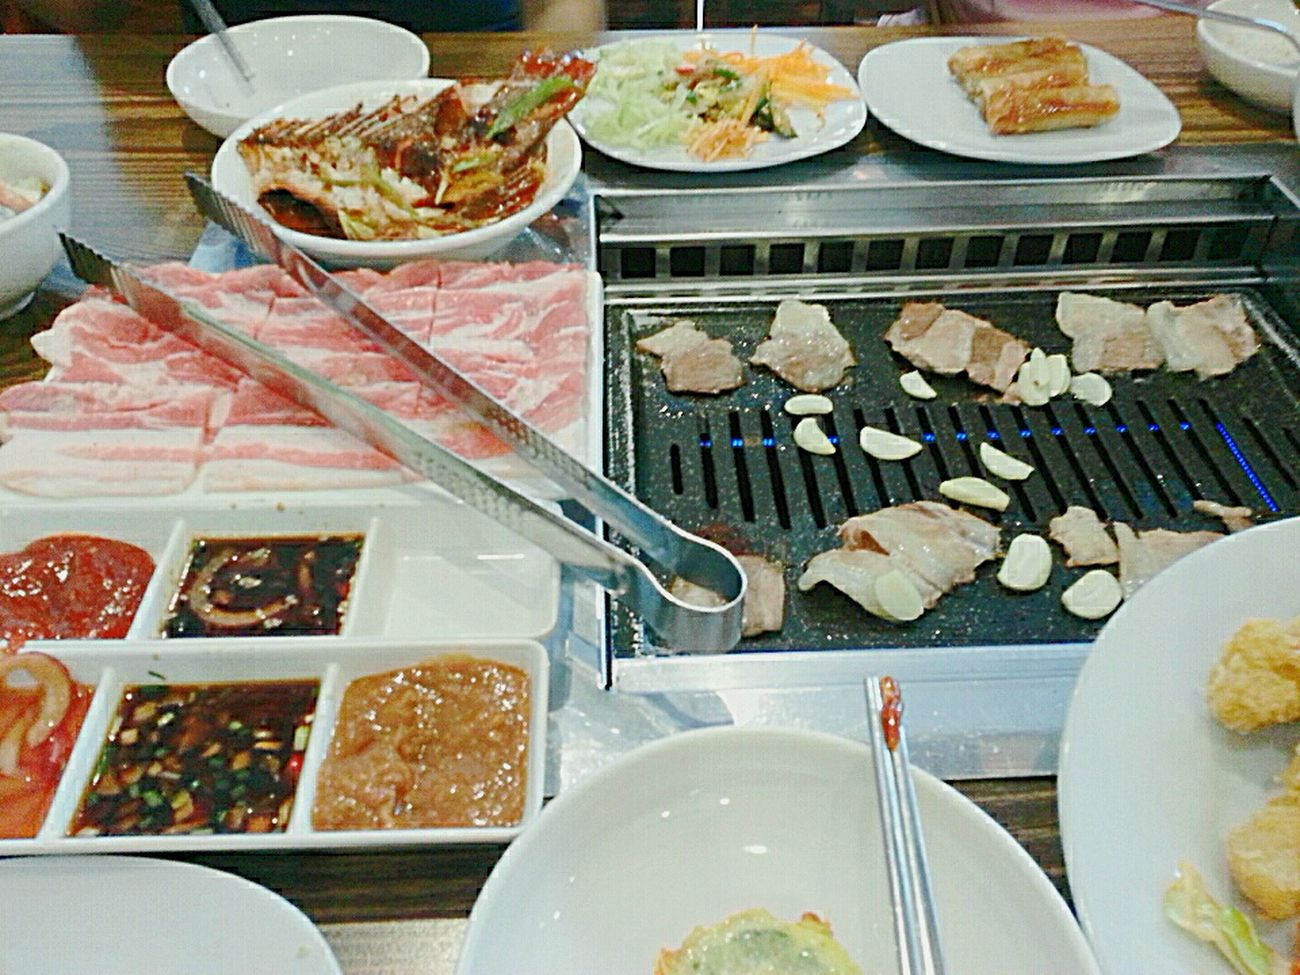 Korean Food Buffet Samgyeopsal  Samgyupsal Grilling Kimchi